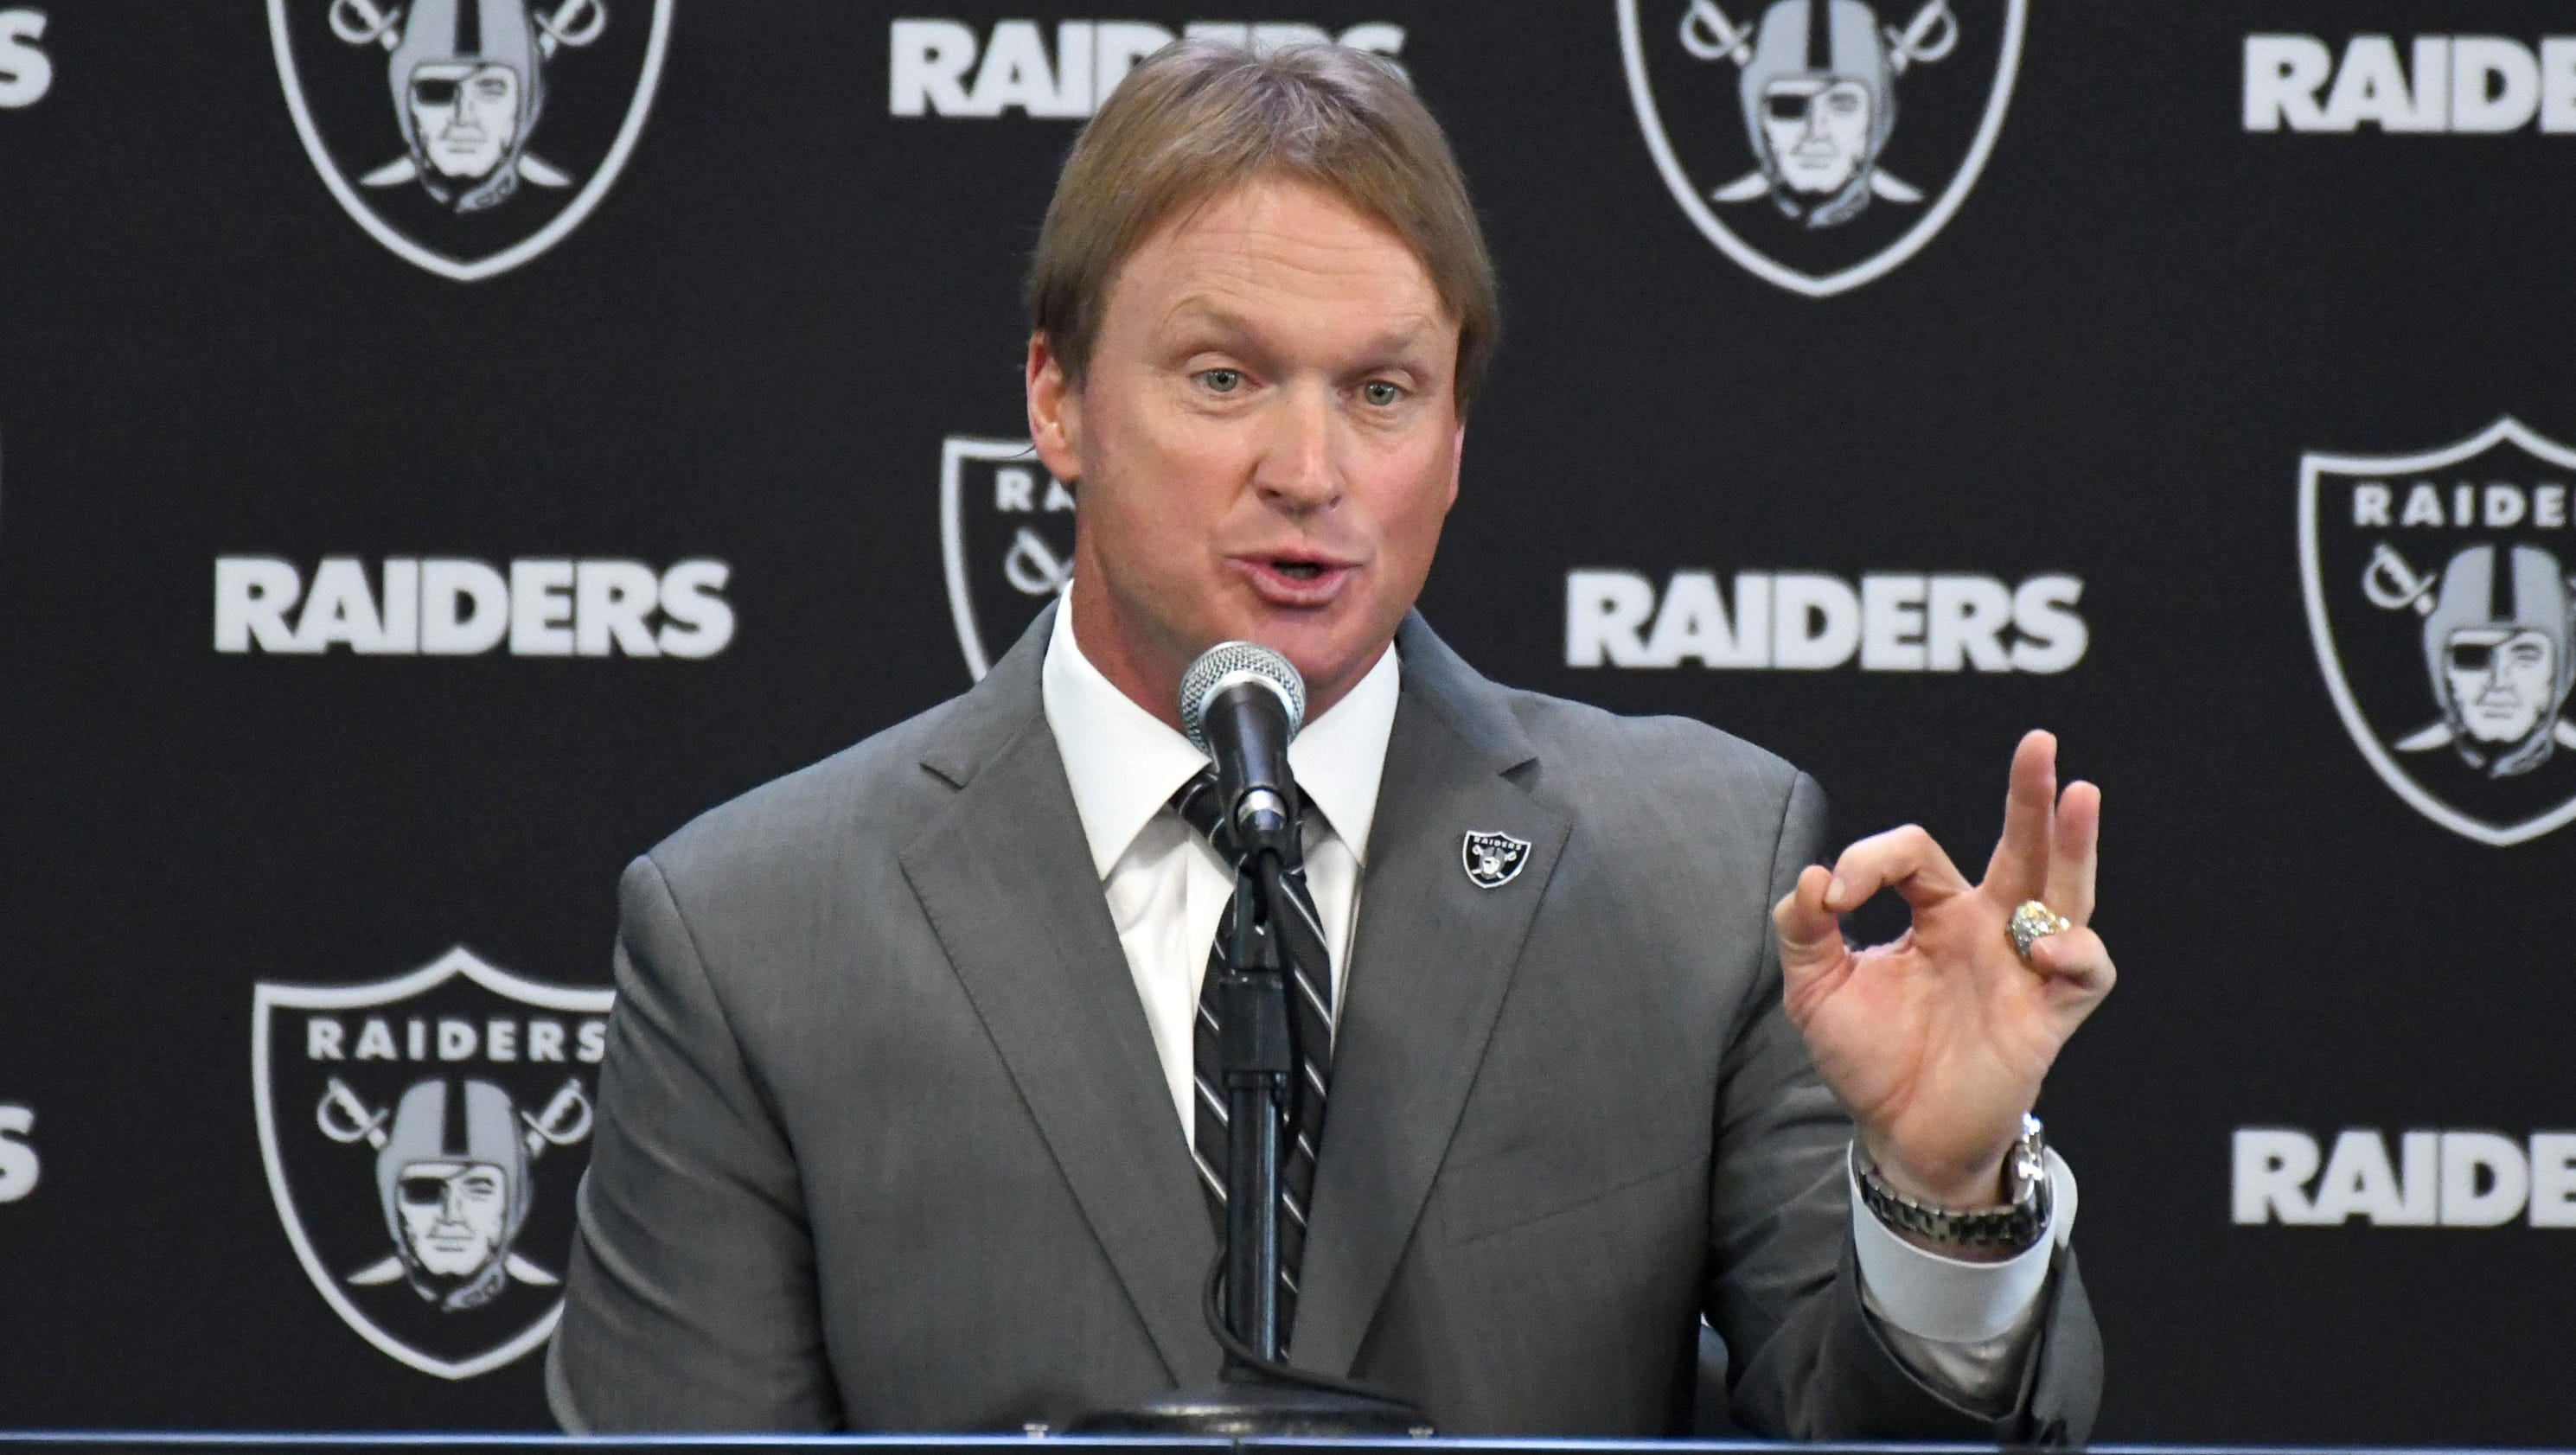 Raiders 2018 schedule: Jon Gruden returns to marquee matchups